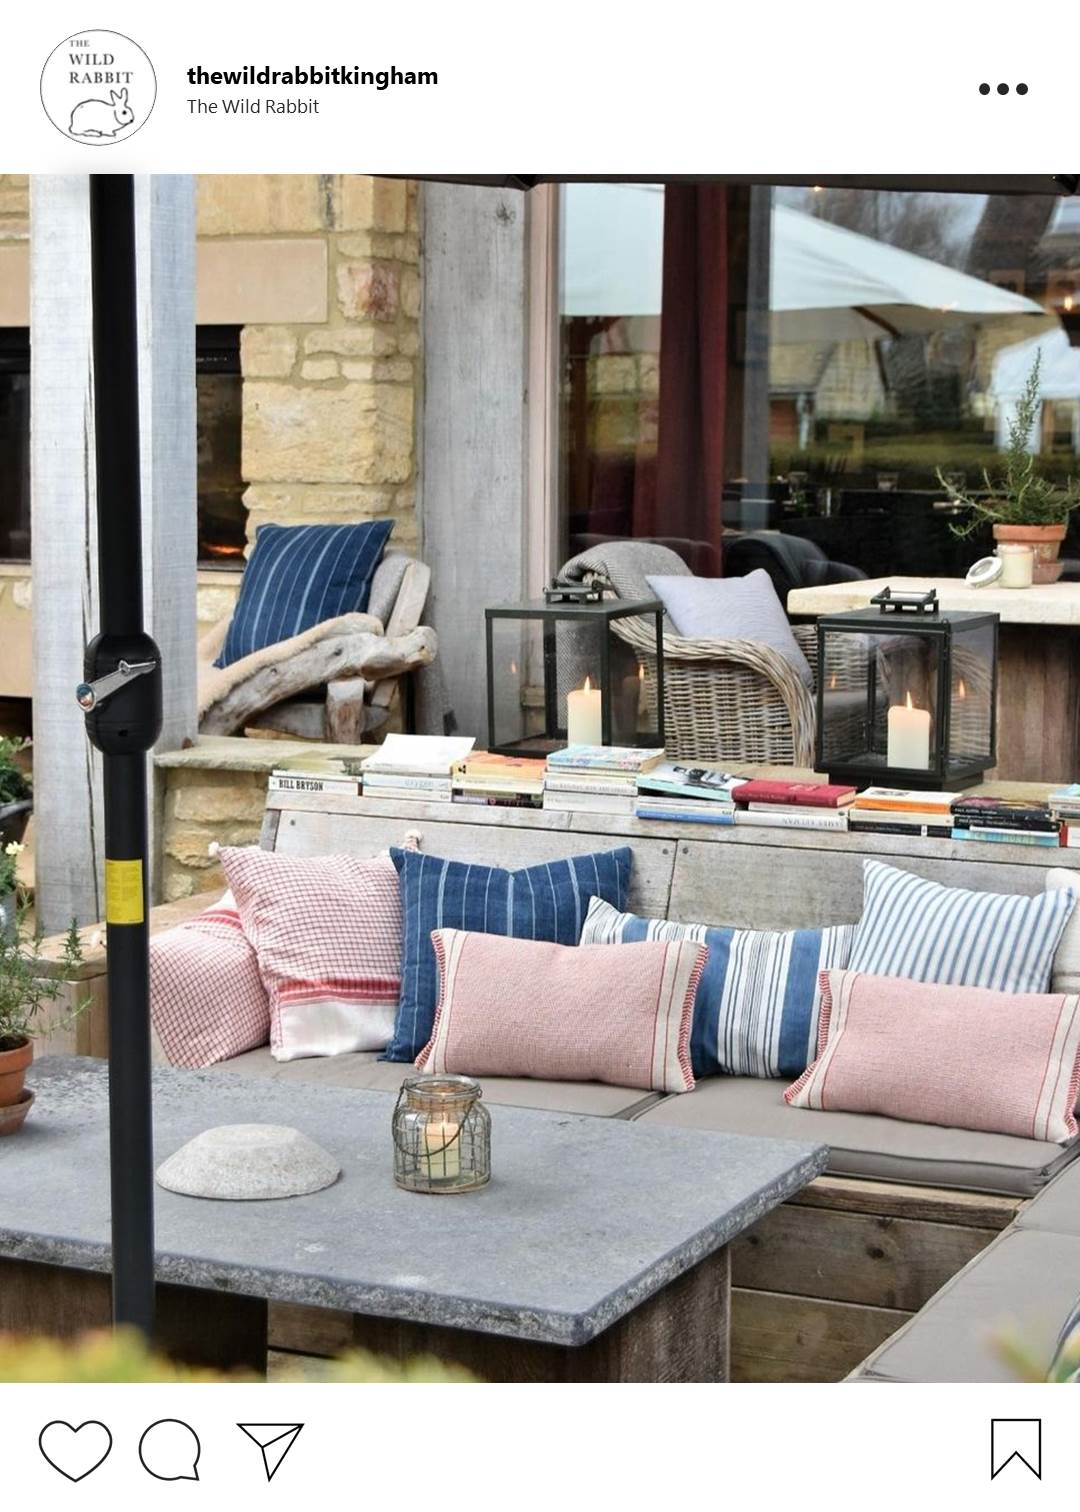 Instaworthy restaurants in Oxfordshire - The Wild Rabbit, Kingham